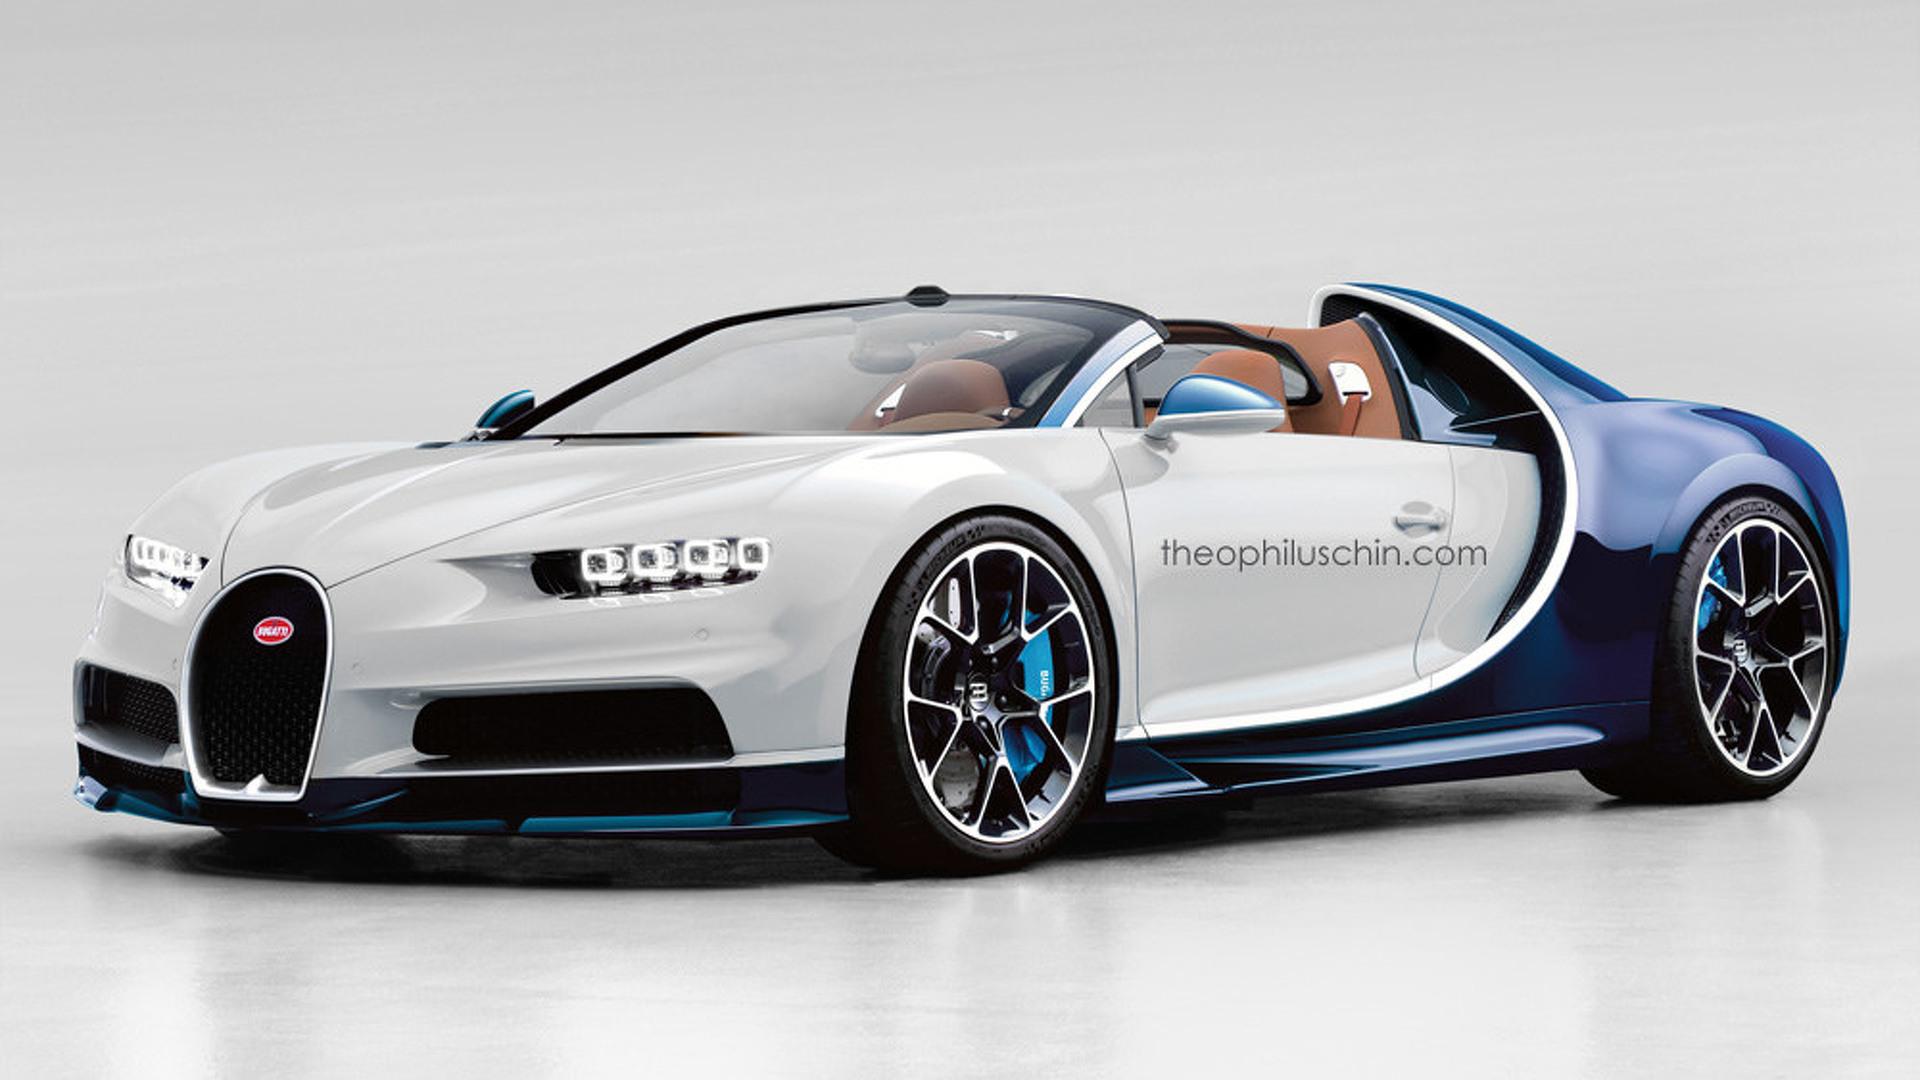 bugatti-chiron-grand-sport-rendering Cozy Bugatti Veyron and Chiron Difference Cars Trend